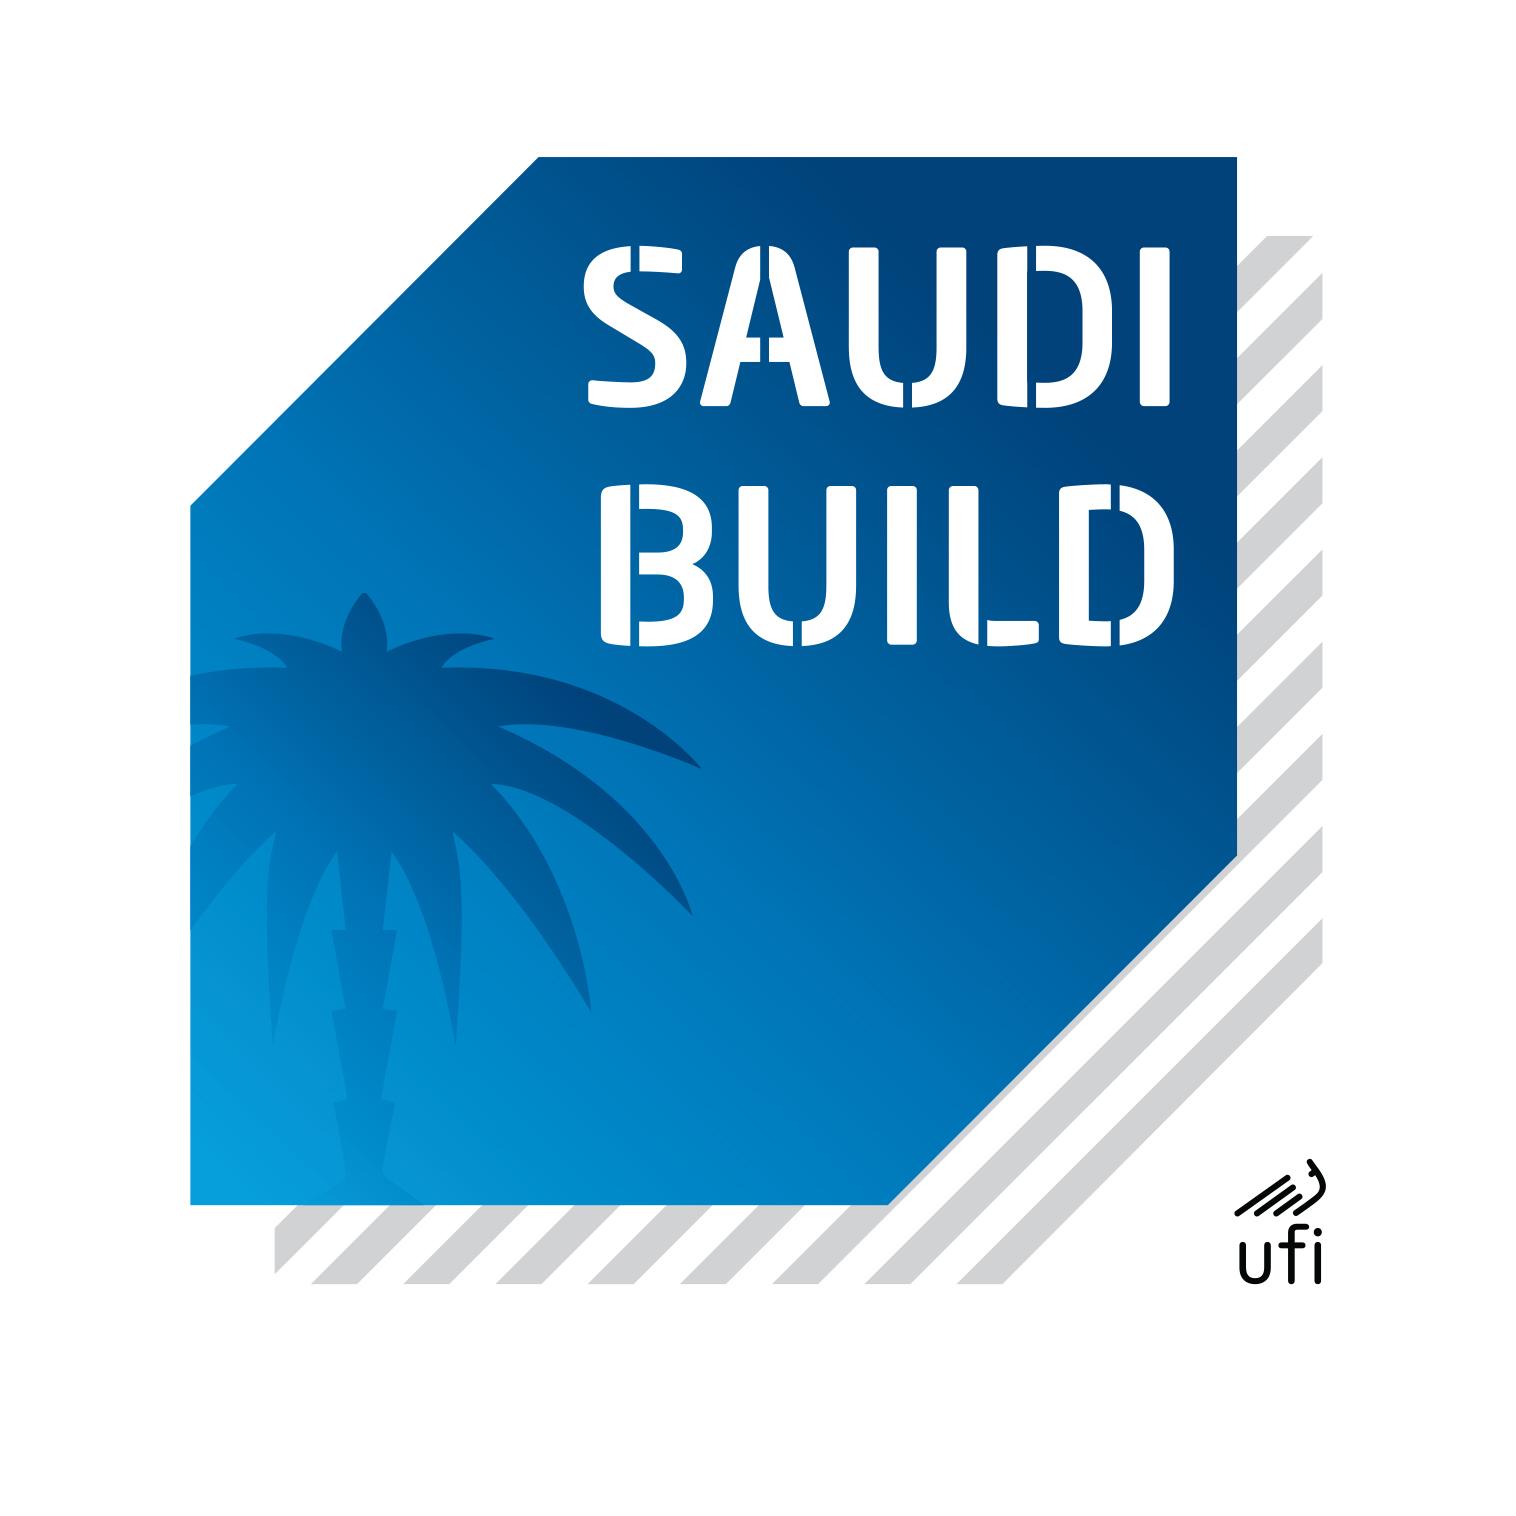 saudi-build-icon